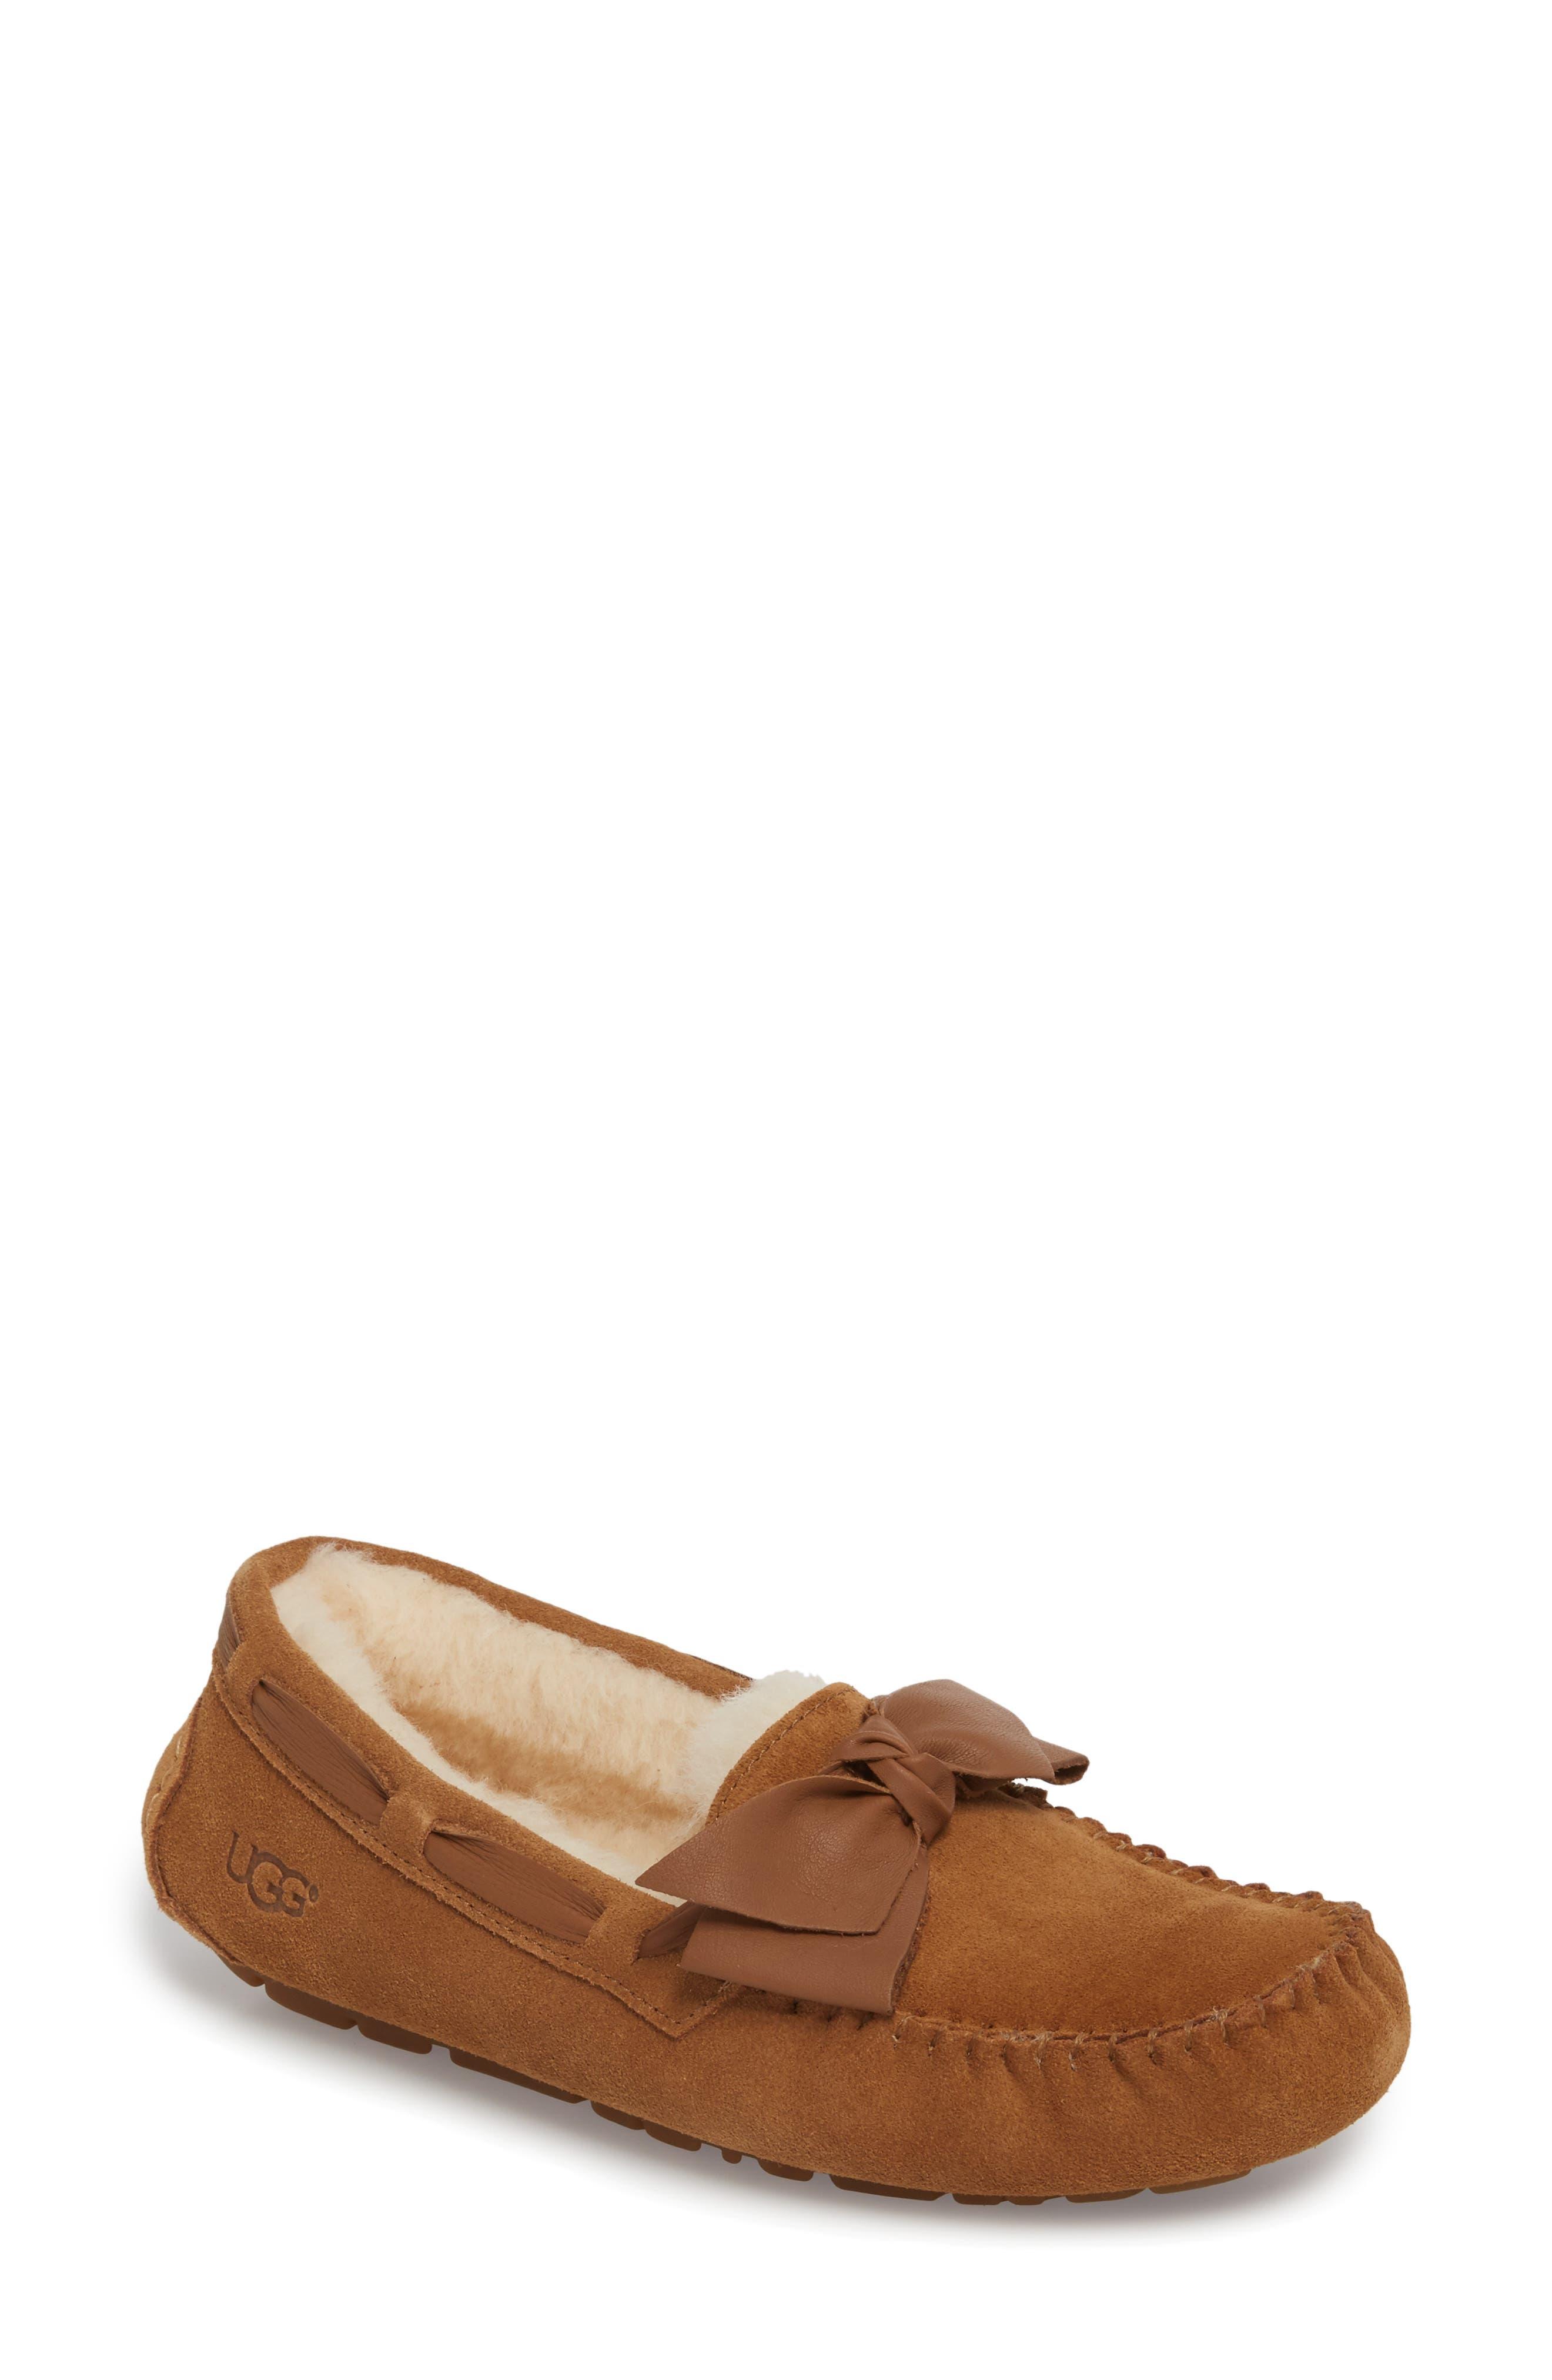 UGG® Dakota Suede Bow Slippers B0OIffe